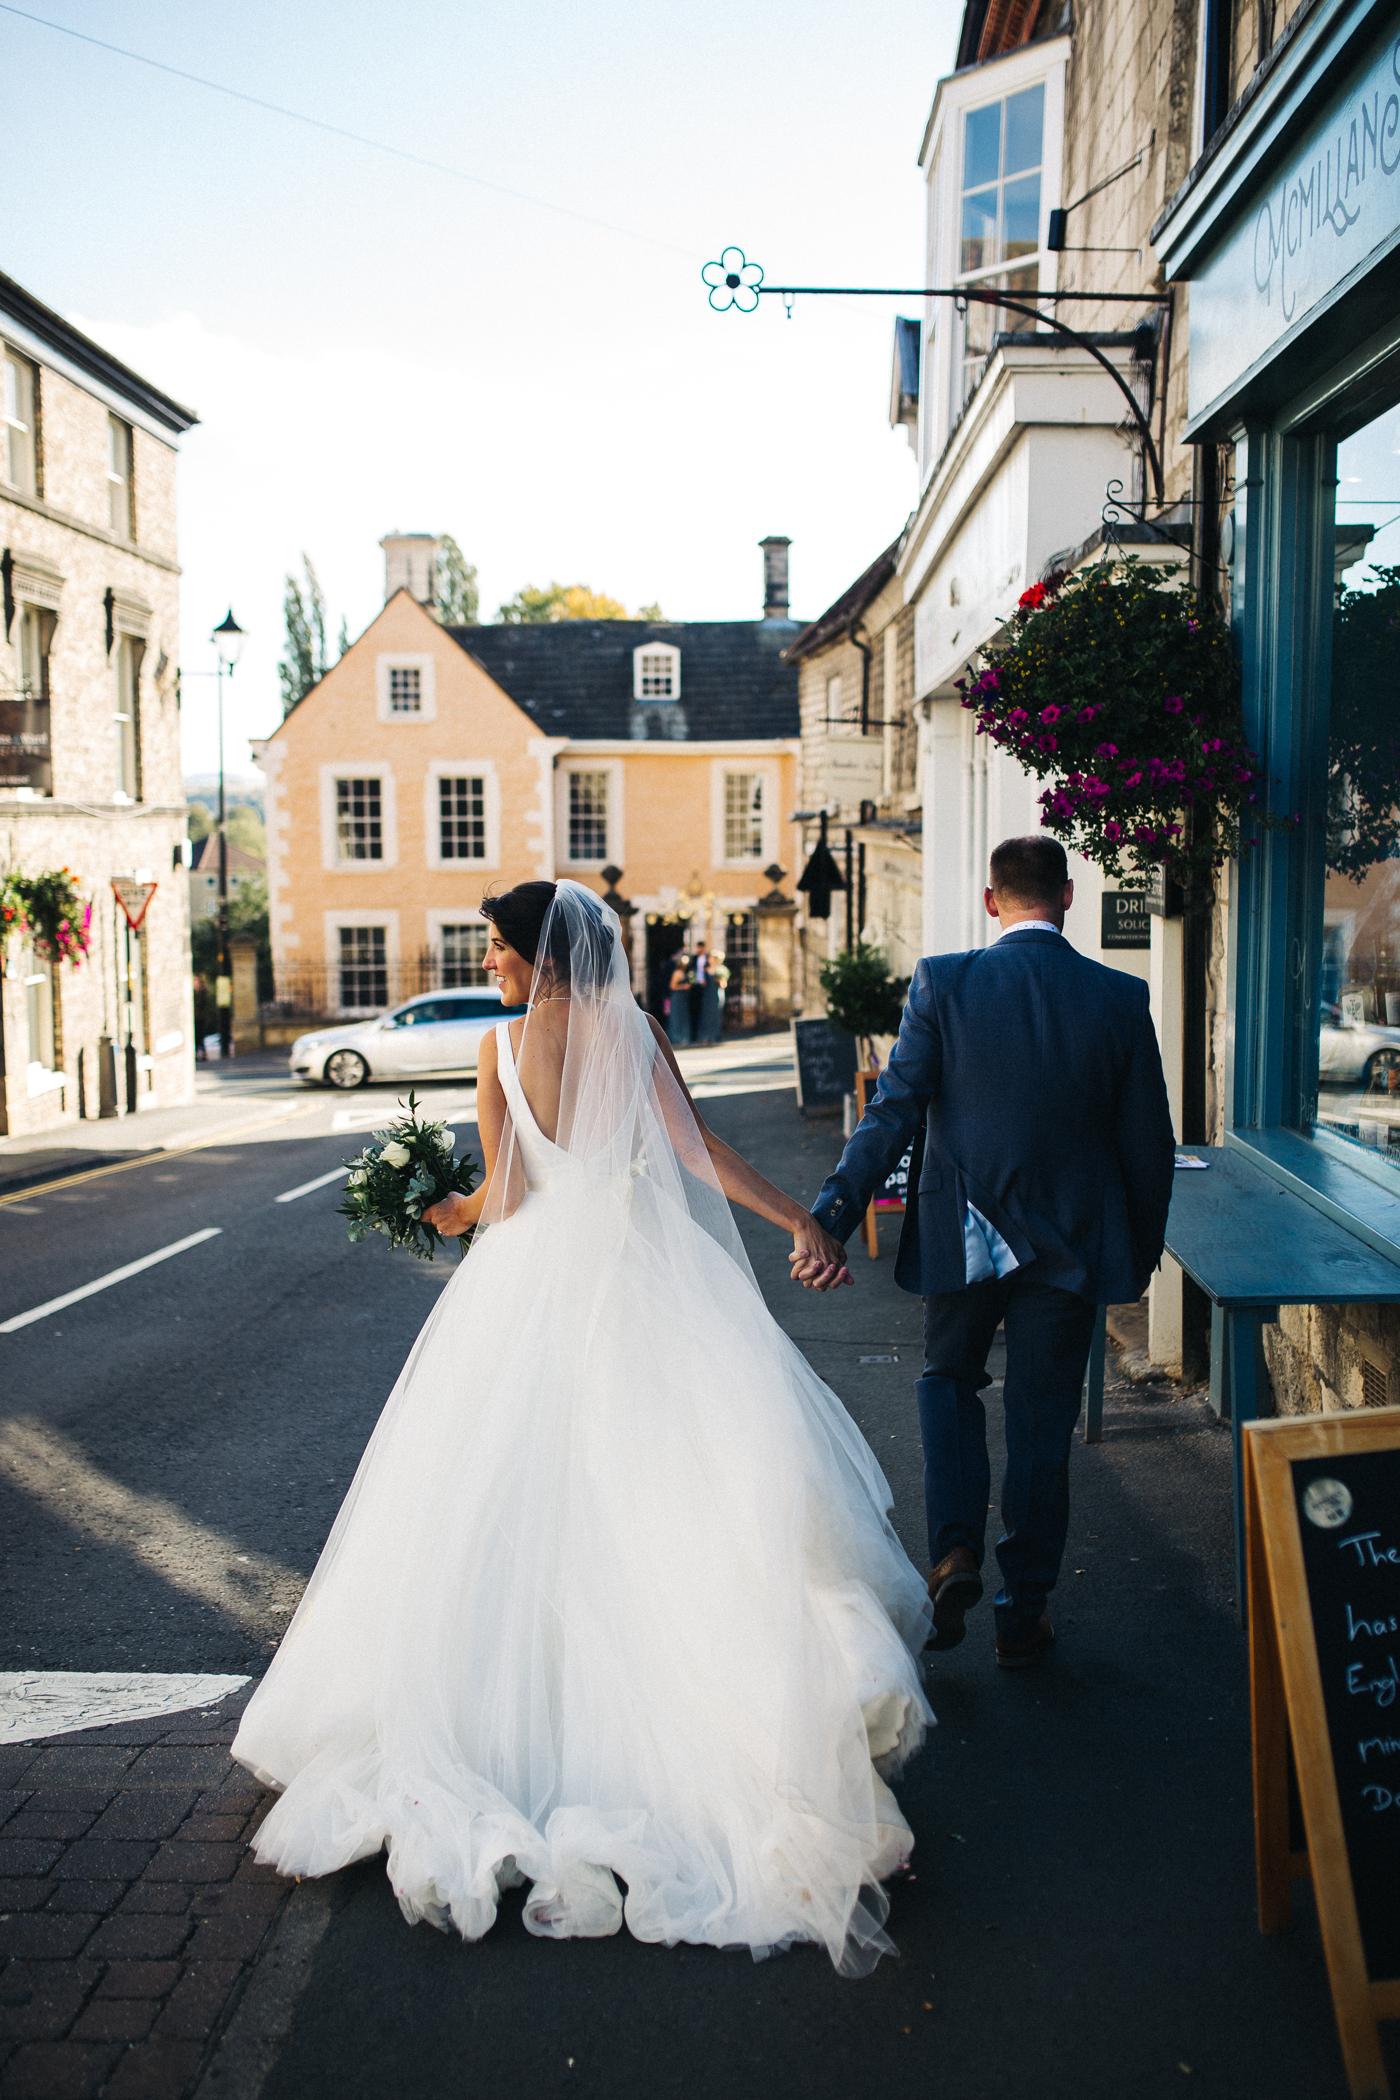 york-house-malton-wedding-photographer-north-yorkshire-0020.jpg